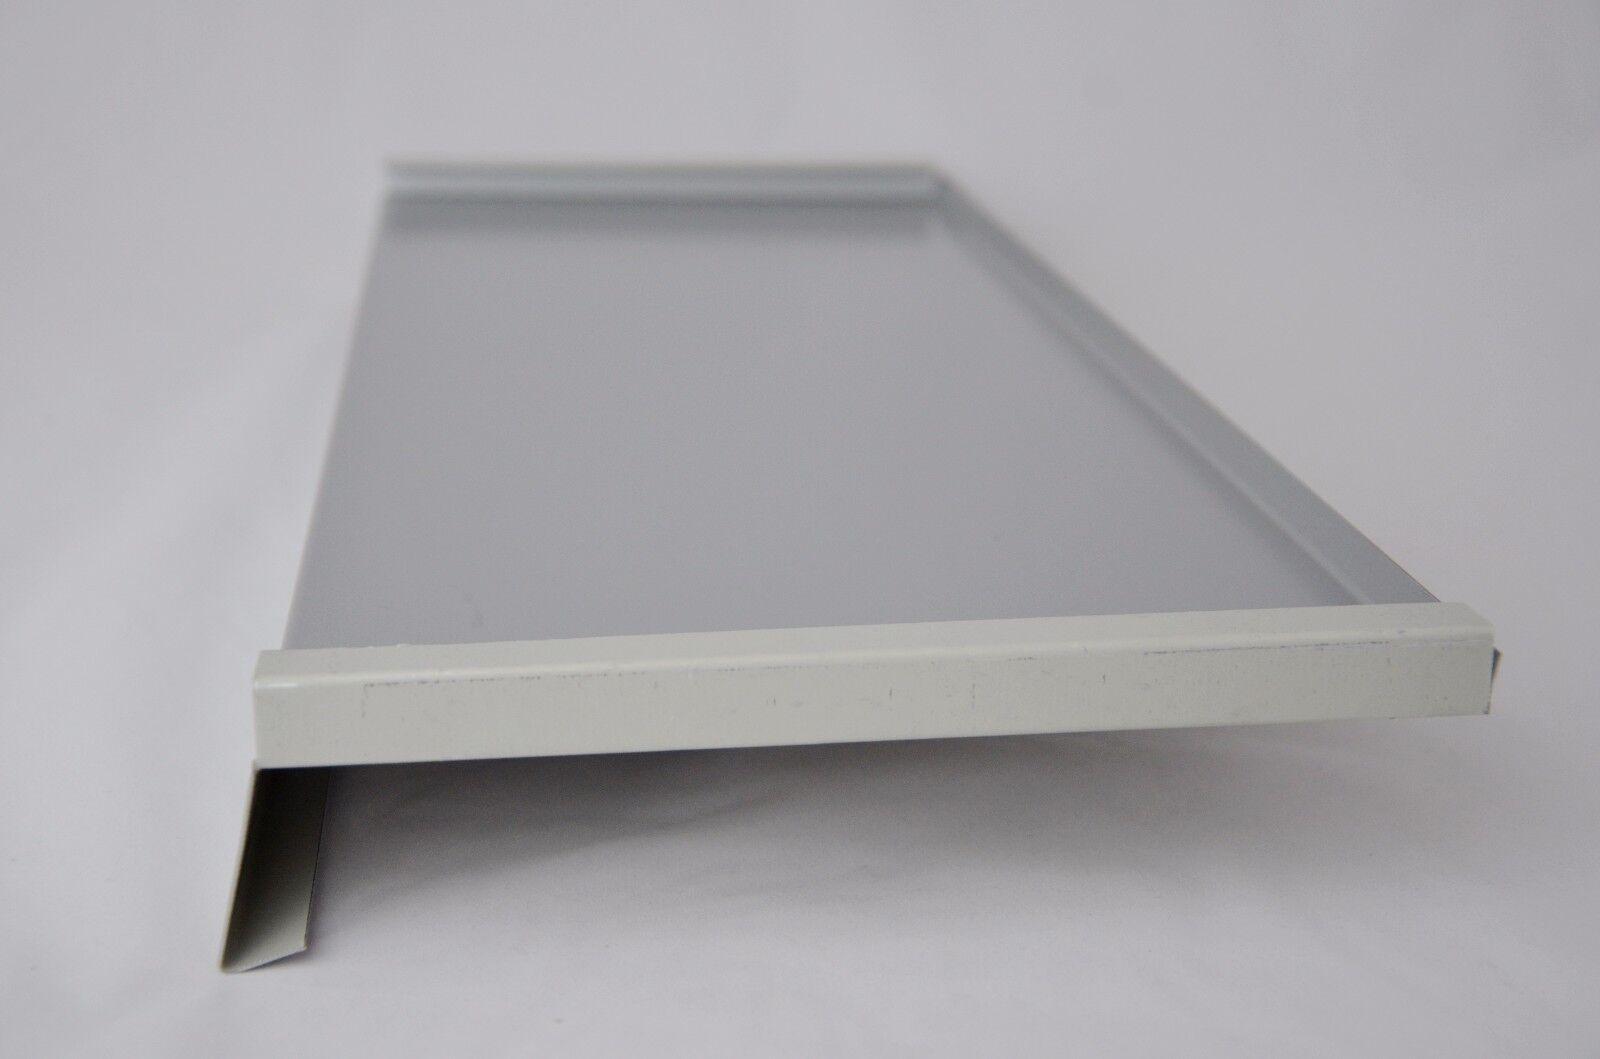 Aluminium Fensterbank; Seiten doppelt gekantet; Silber RAL 9006 ...